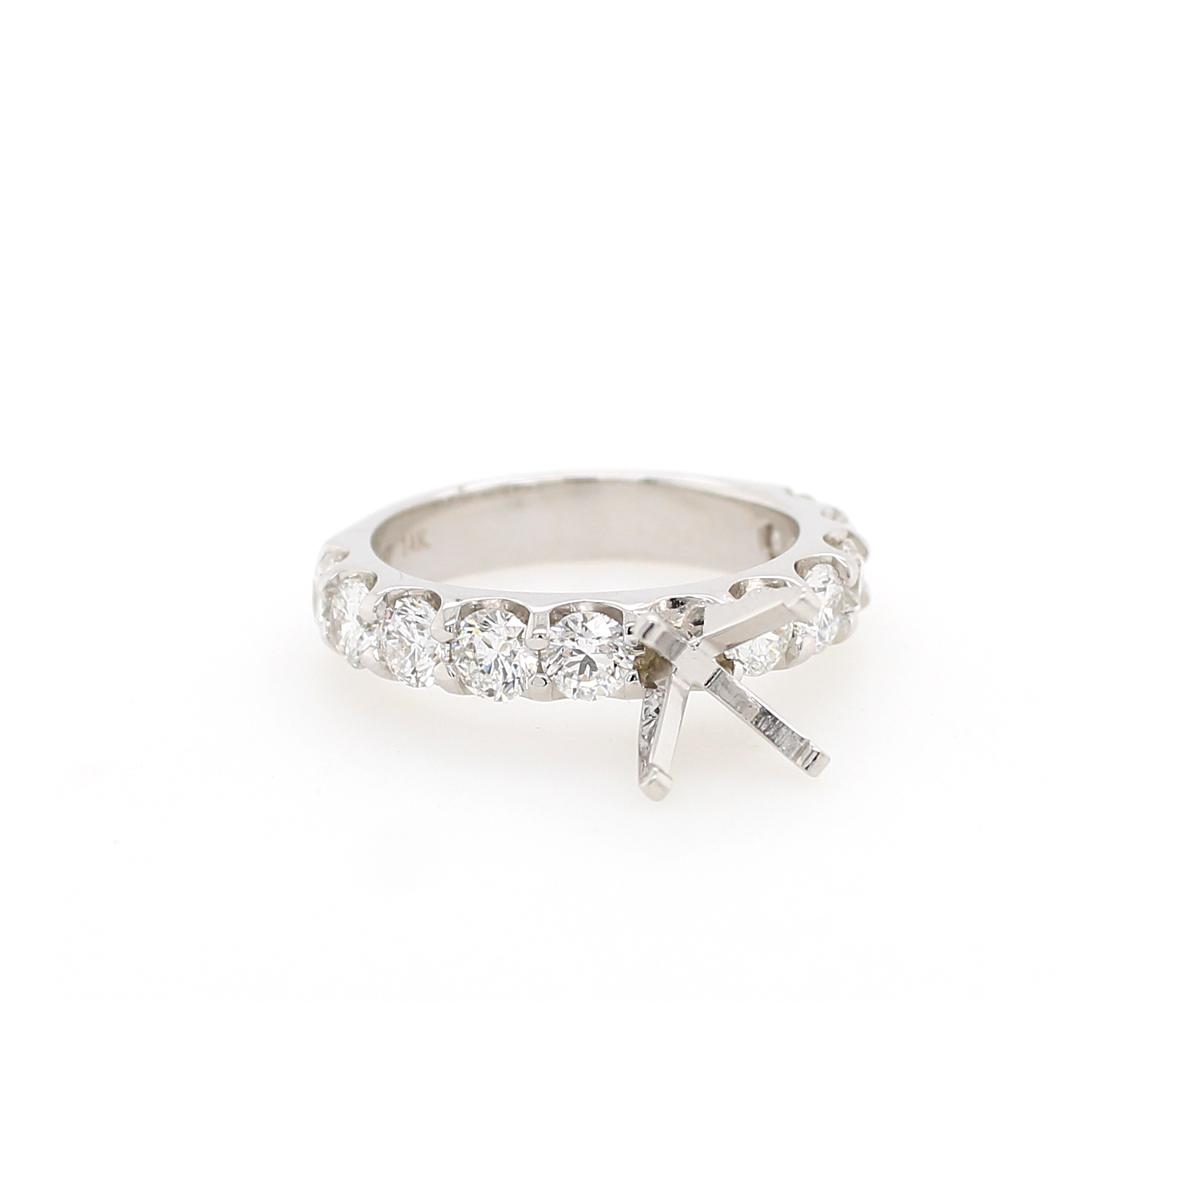 Shefi Diamonds 14 Karat White Gold 1.5 Carat Diamond Semi-Mount Engagement Ring